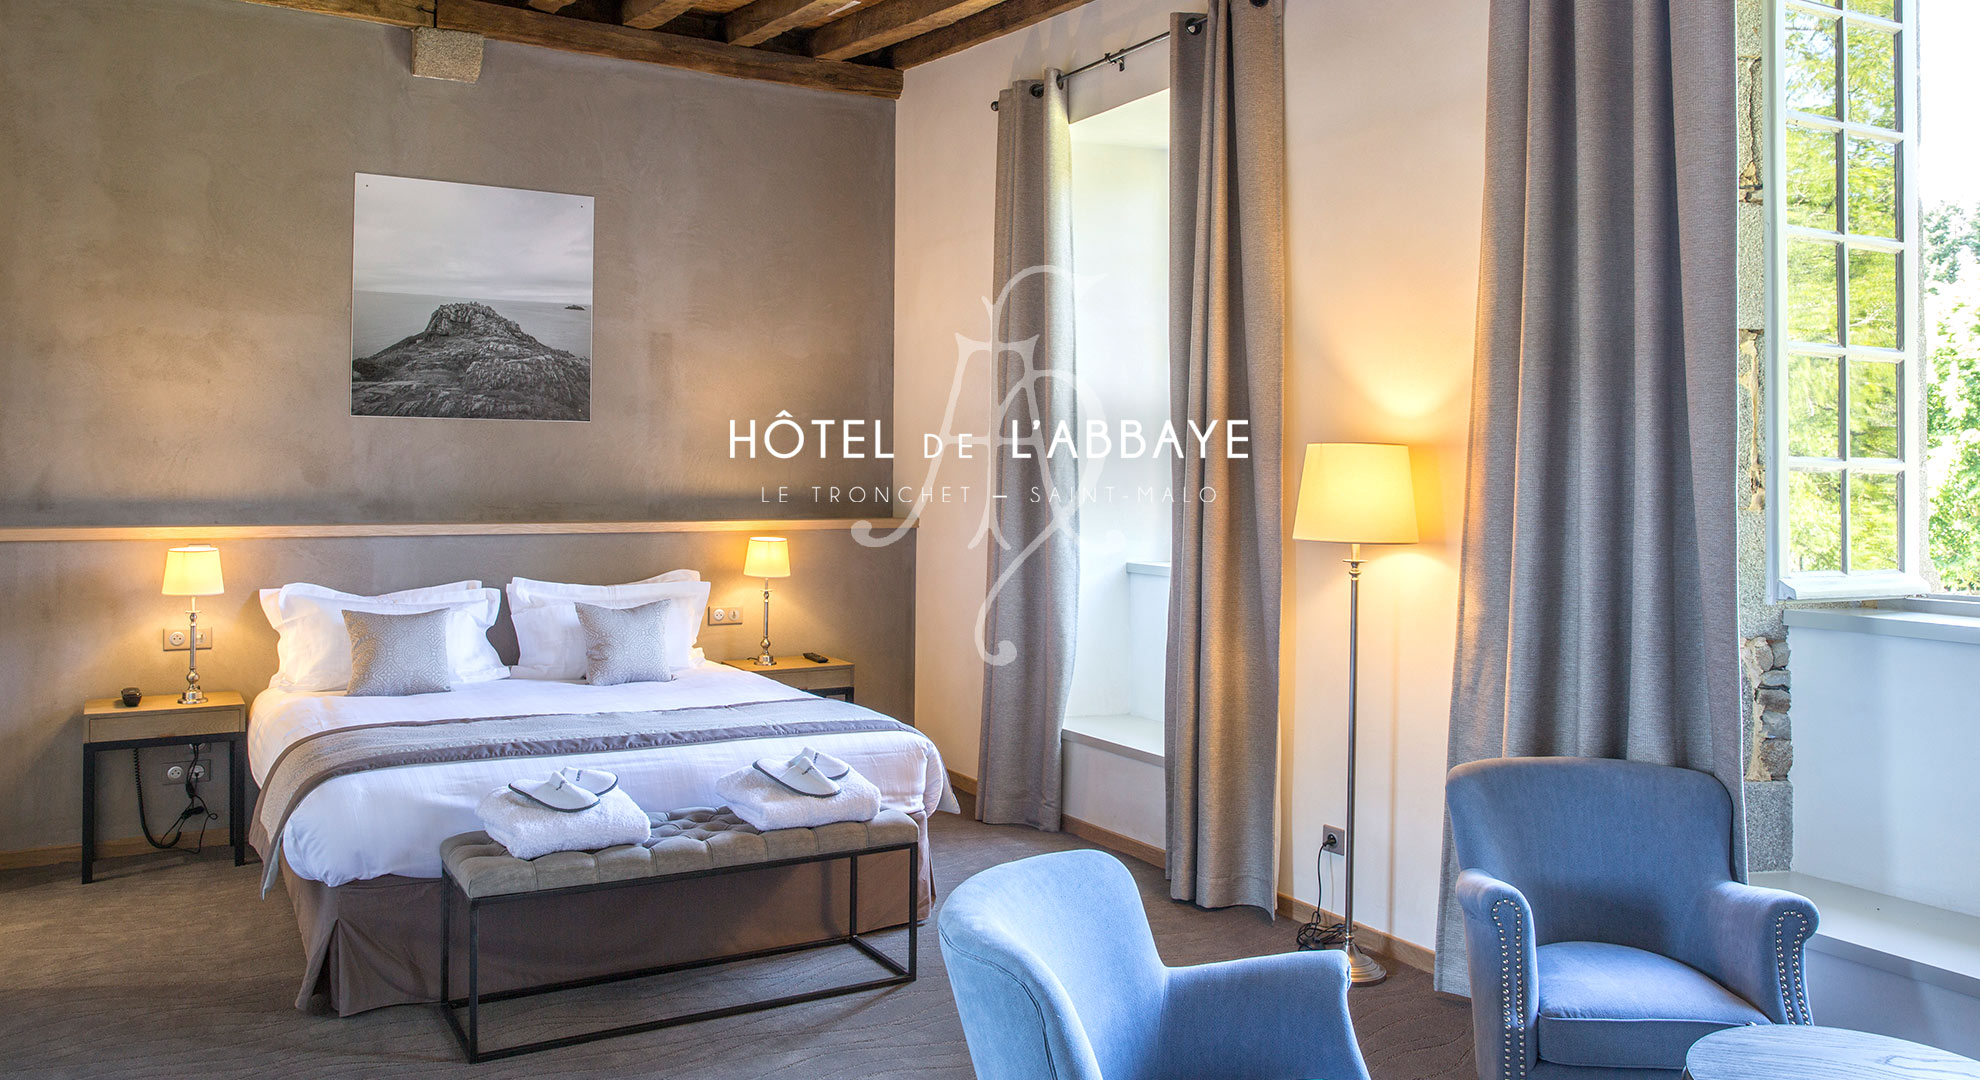 hotel-de-labbaye-le-tronchet-saint-malo